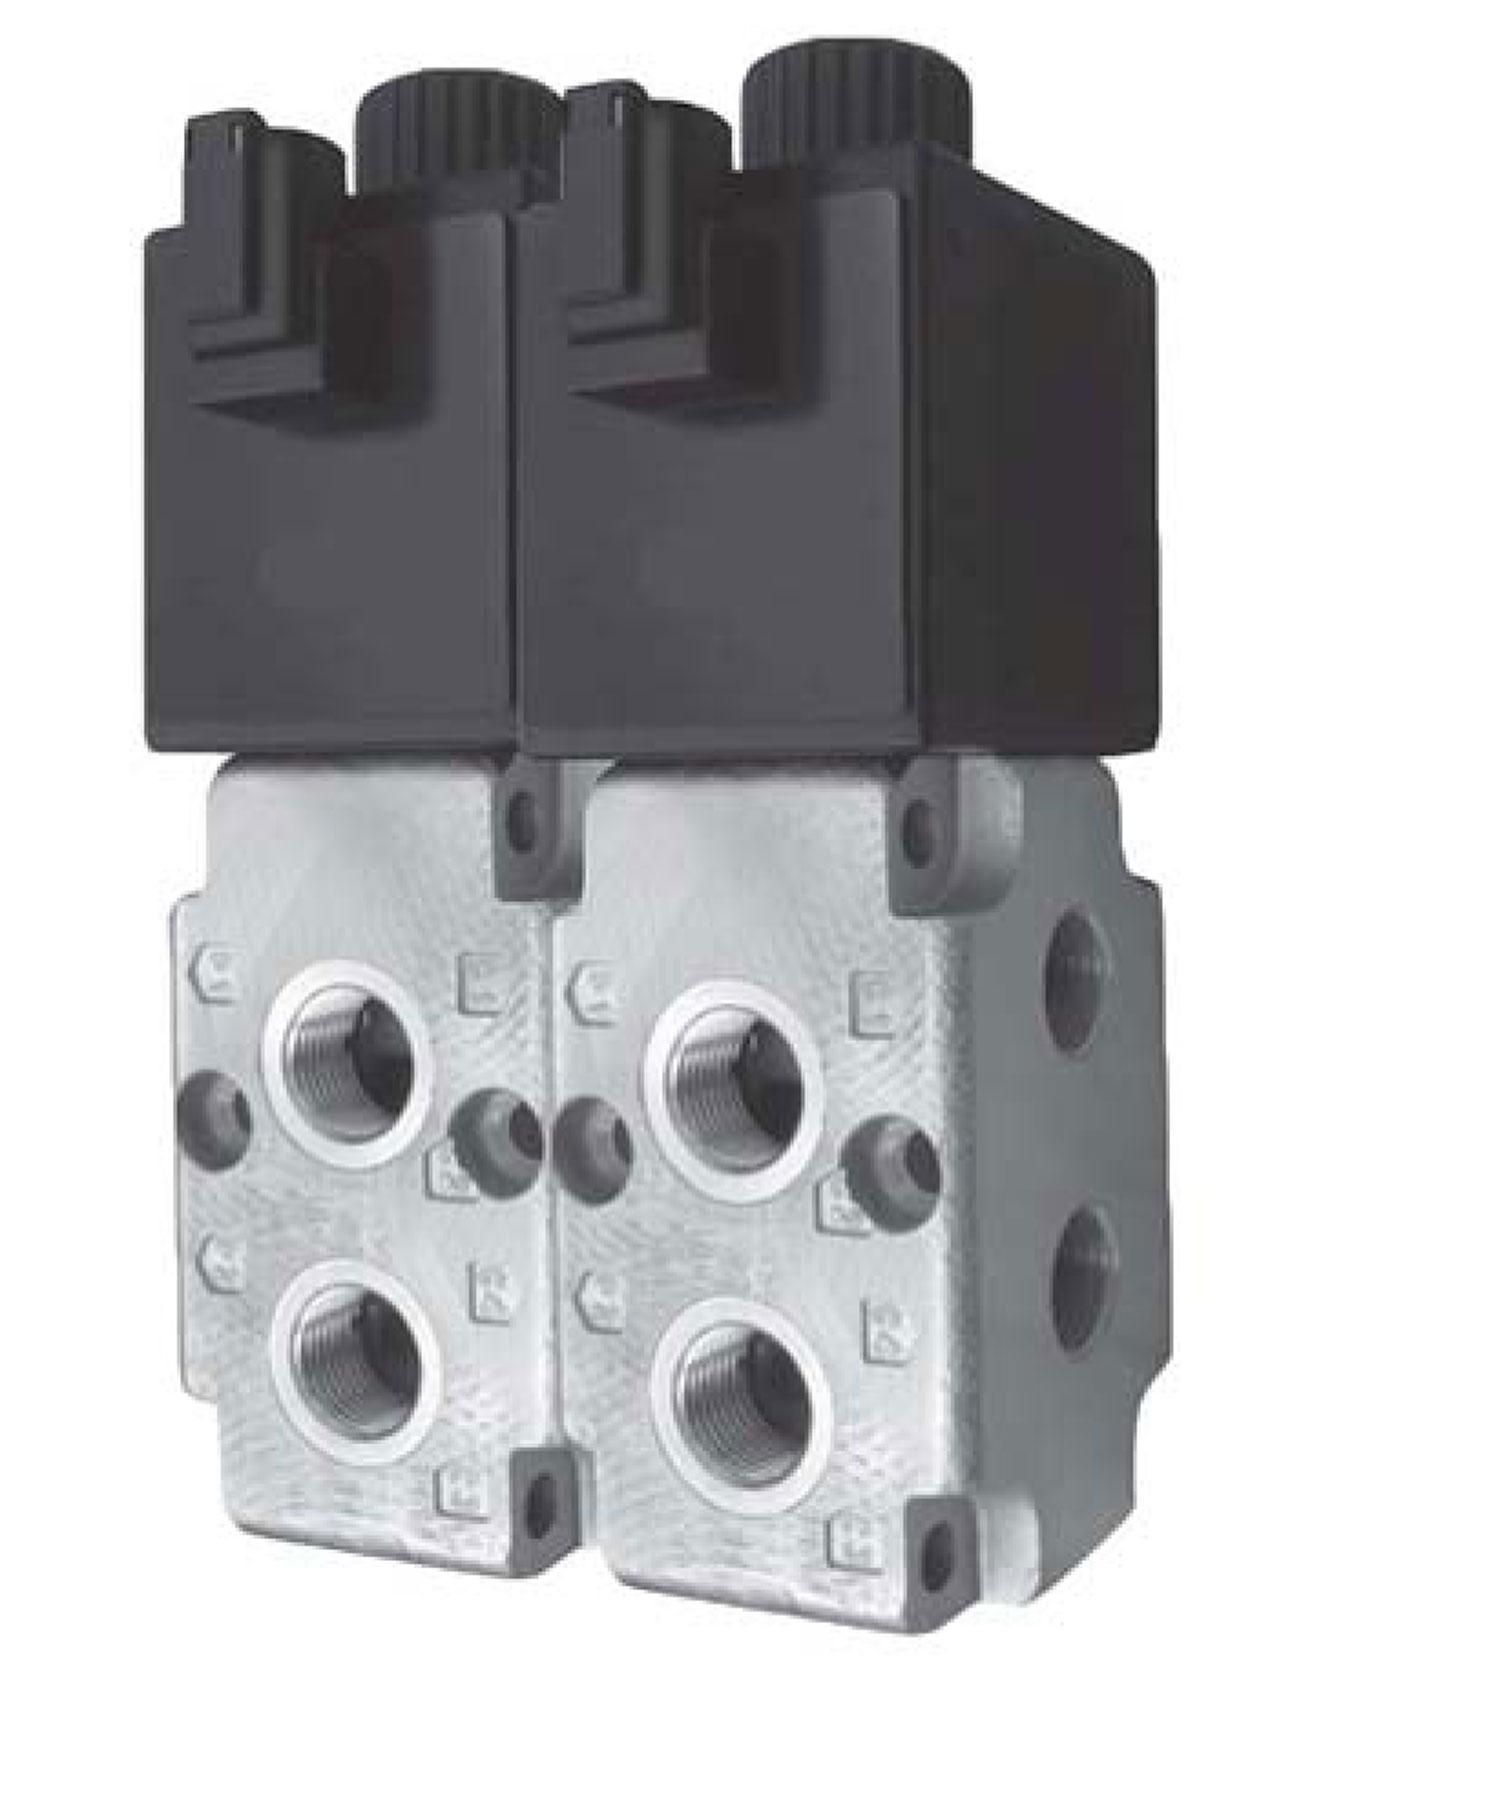 hight resolution of 1jz ignitor wiring diagram 2jz gte toyota ignitor wiring ignitor for furnace wire diagram sr20det ignitor